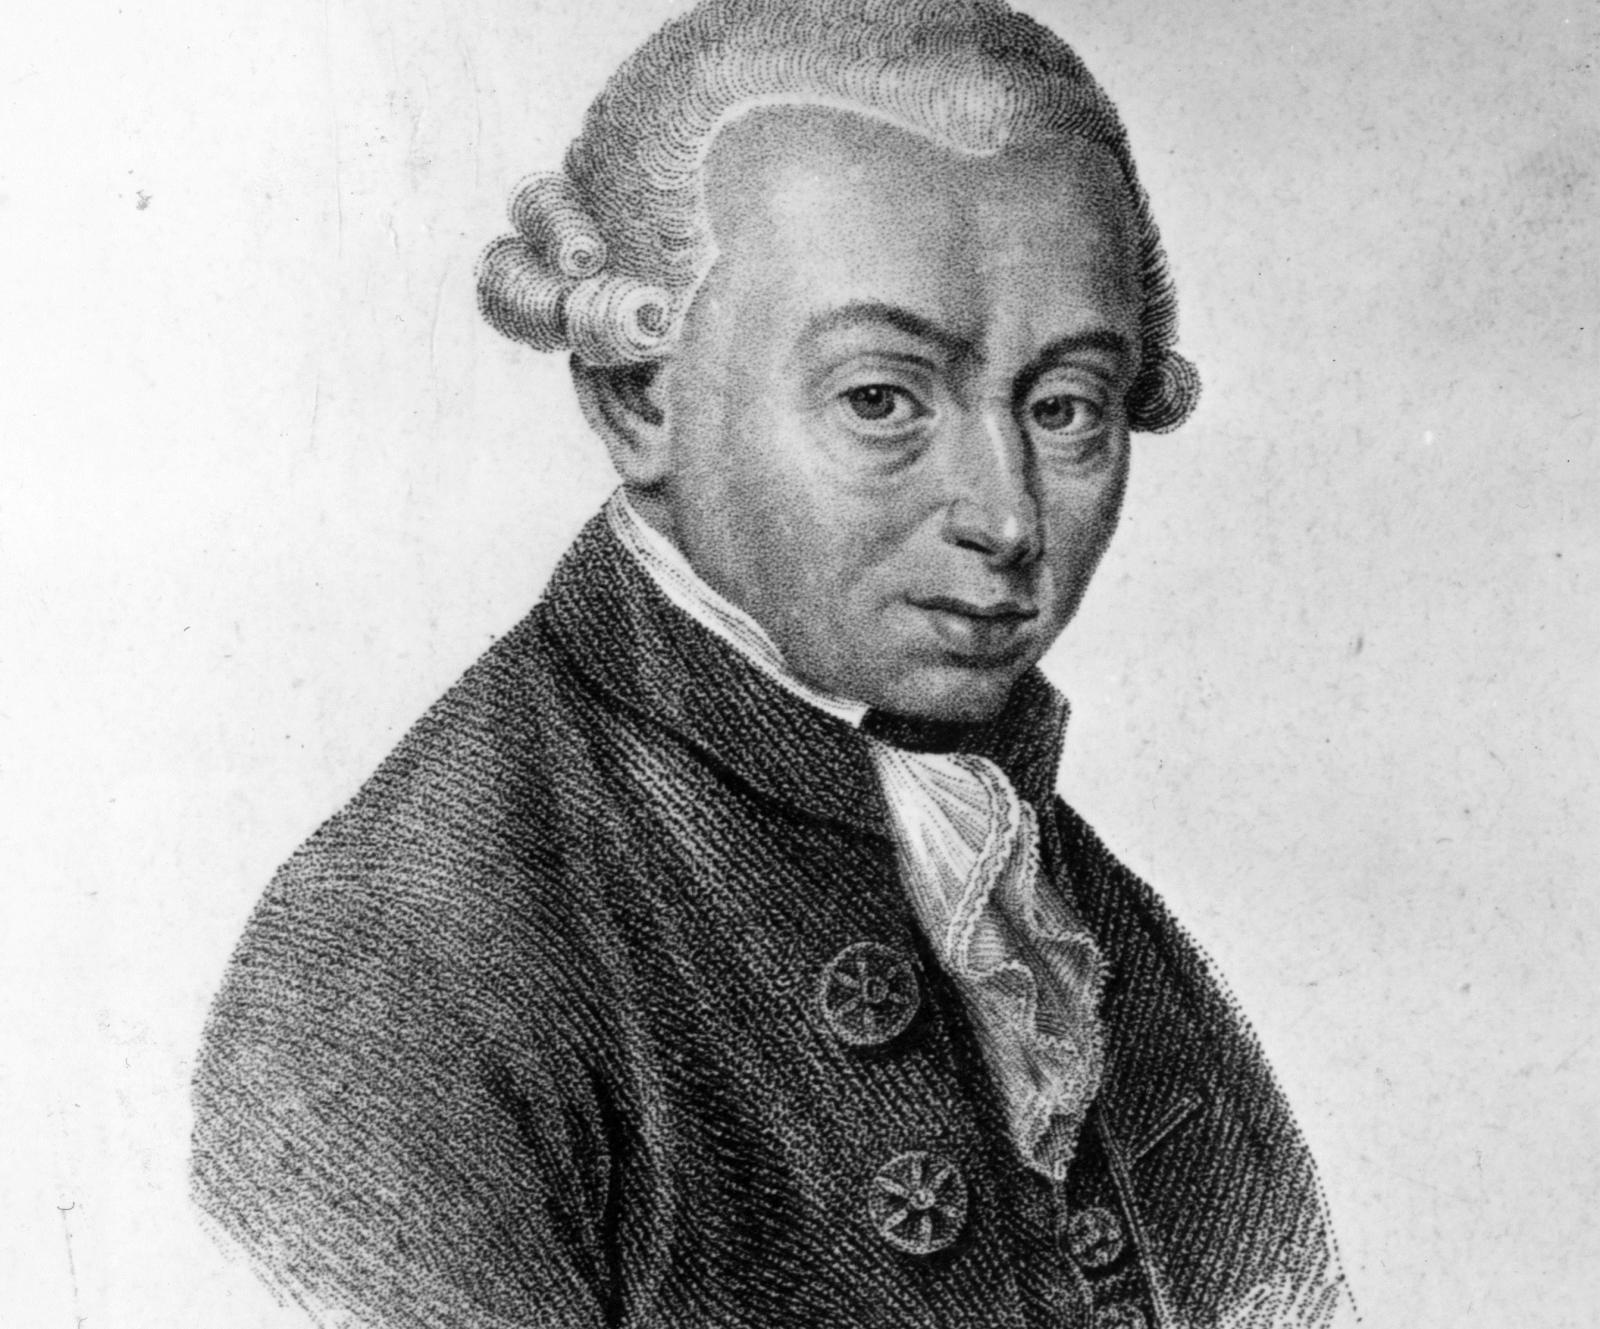 German philosopher Immanuel Kant